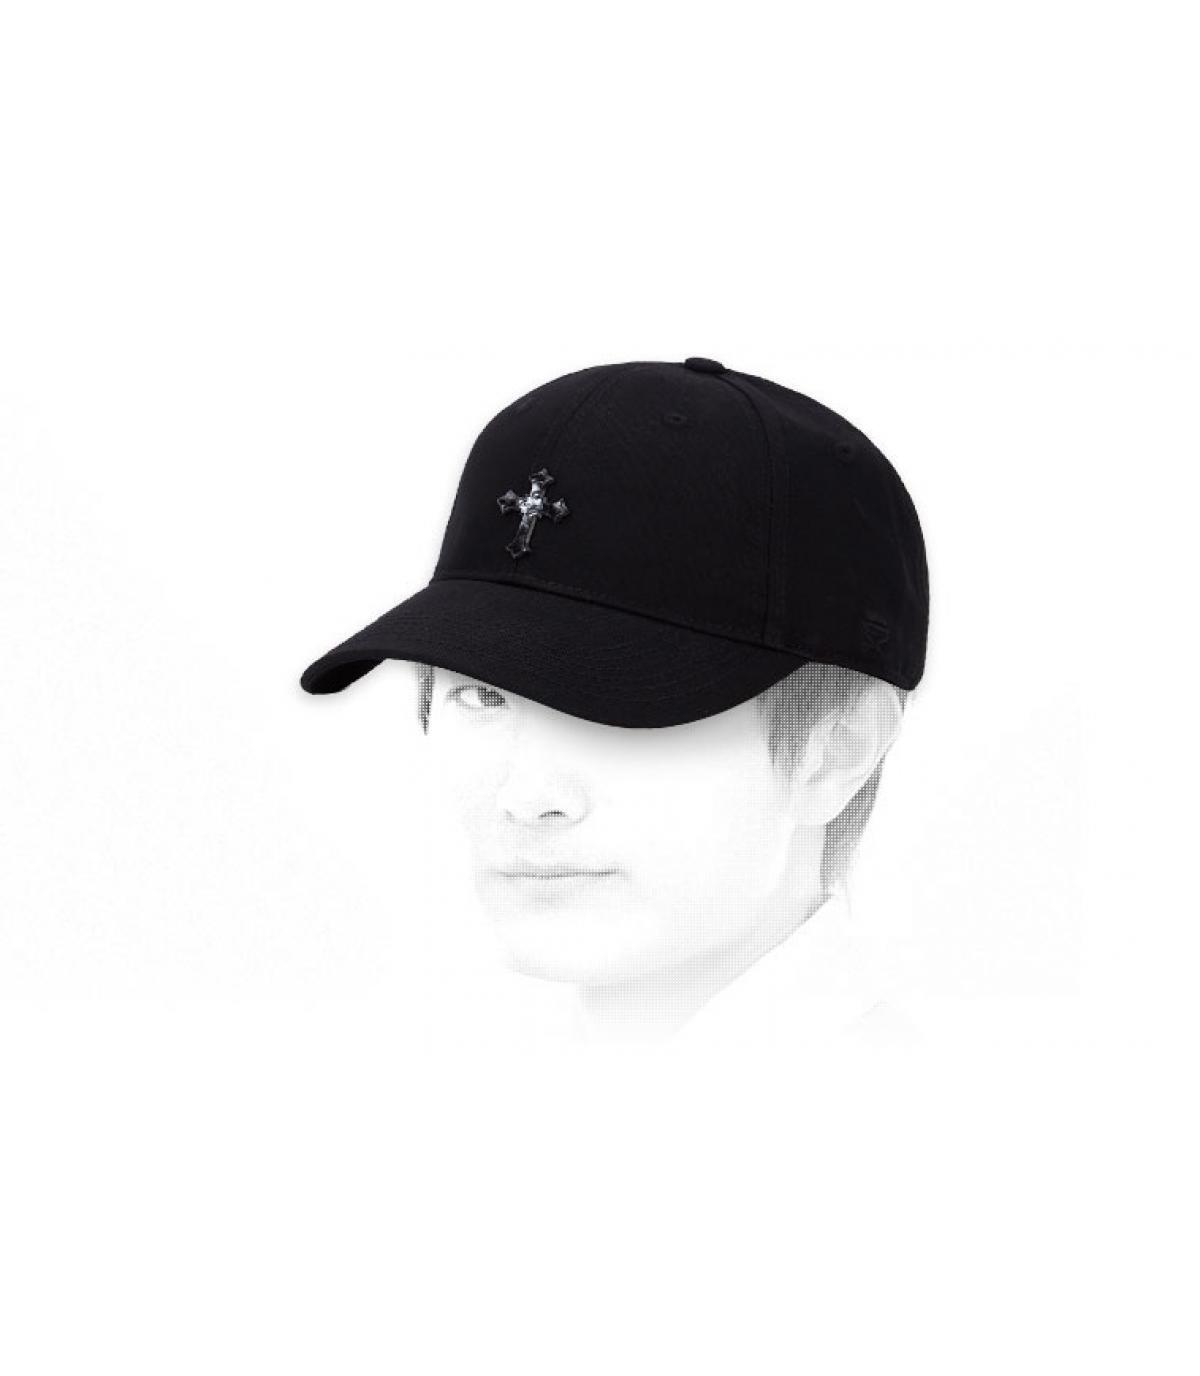 gorra Marley negro